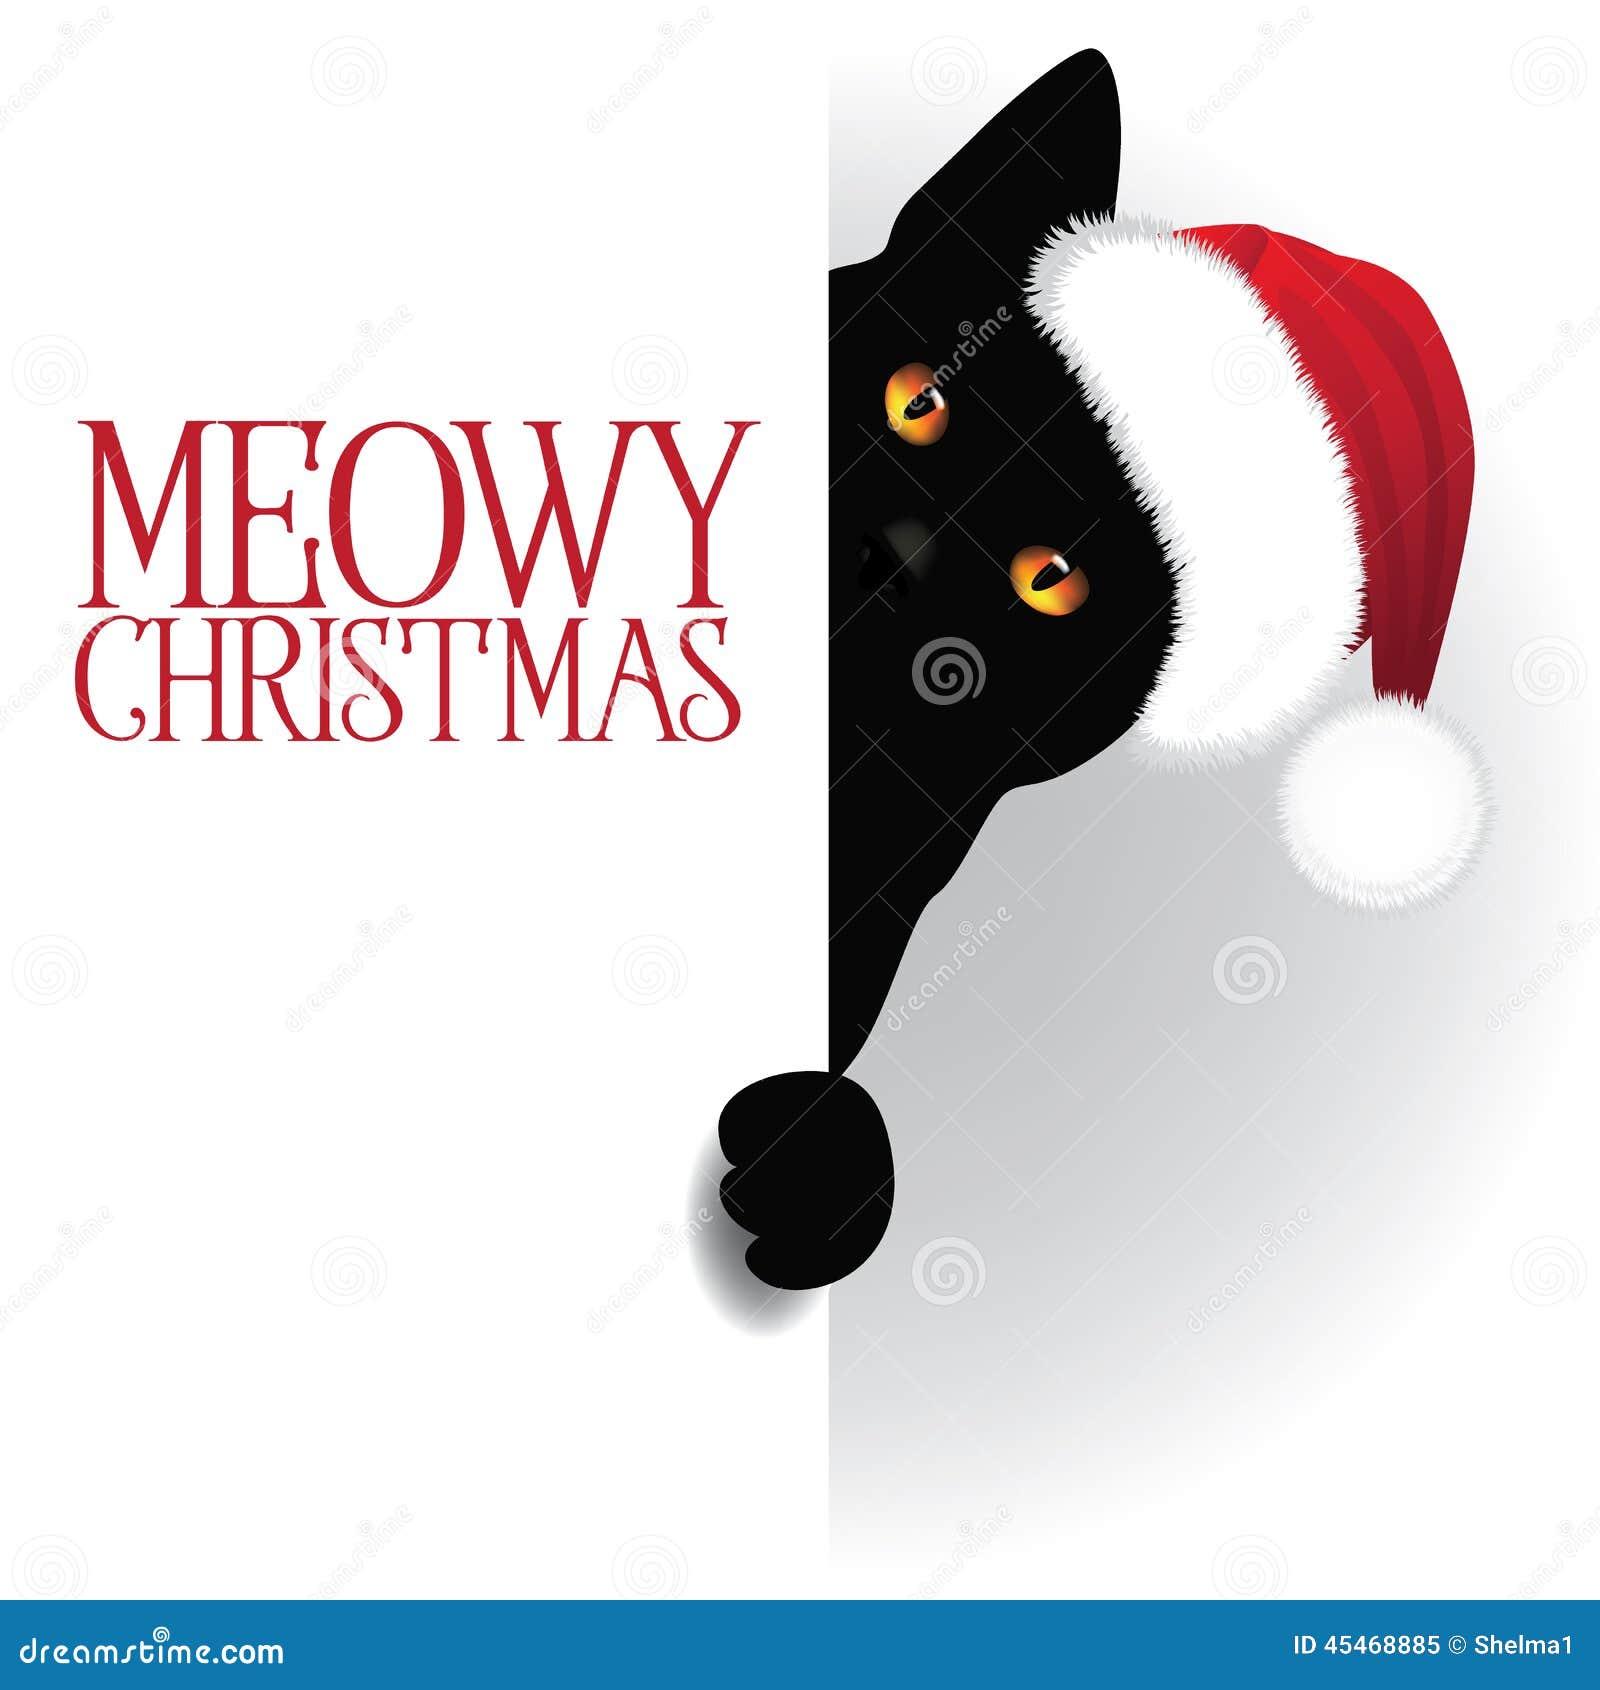 Meowy Christmas.Meowy Christmas Peeking Cat Background Stock Vector